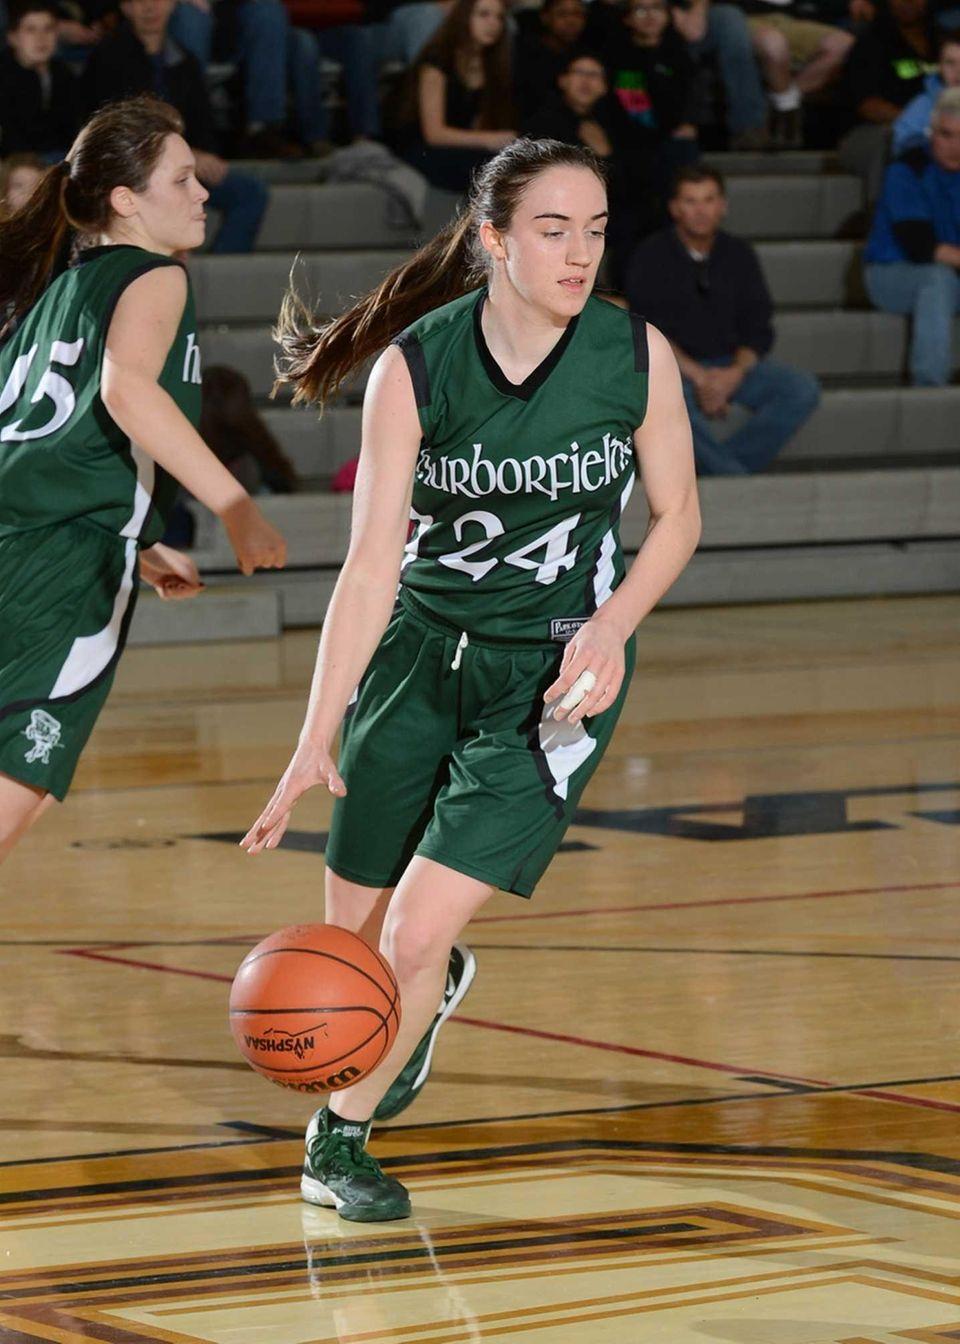 Harborfield's Bridget Ryan bring the ball up during